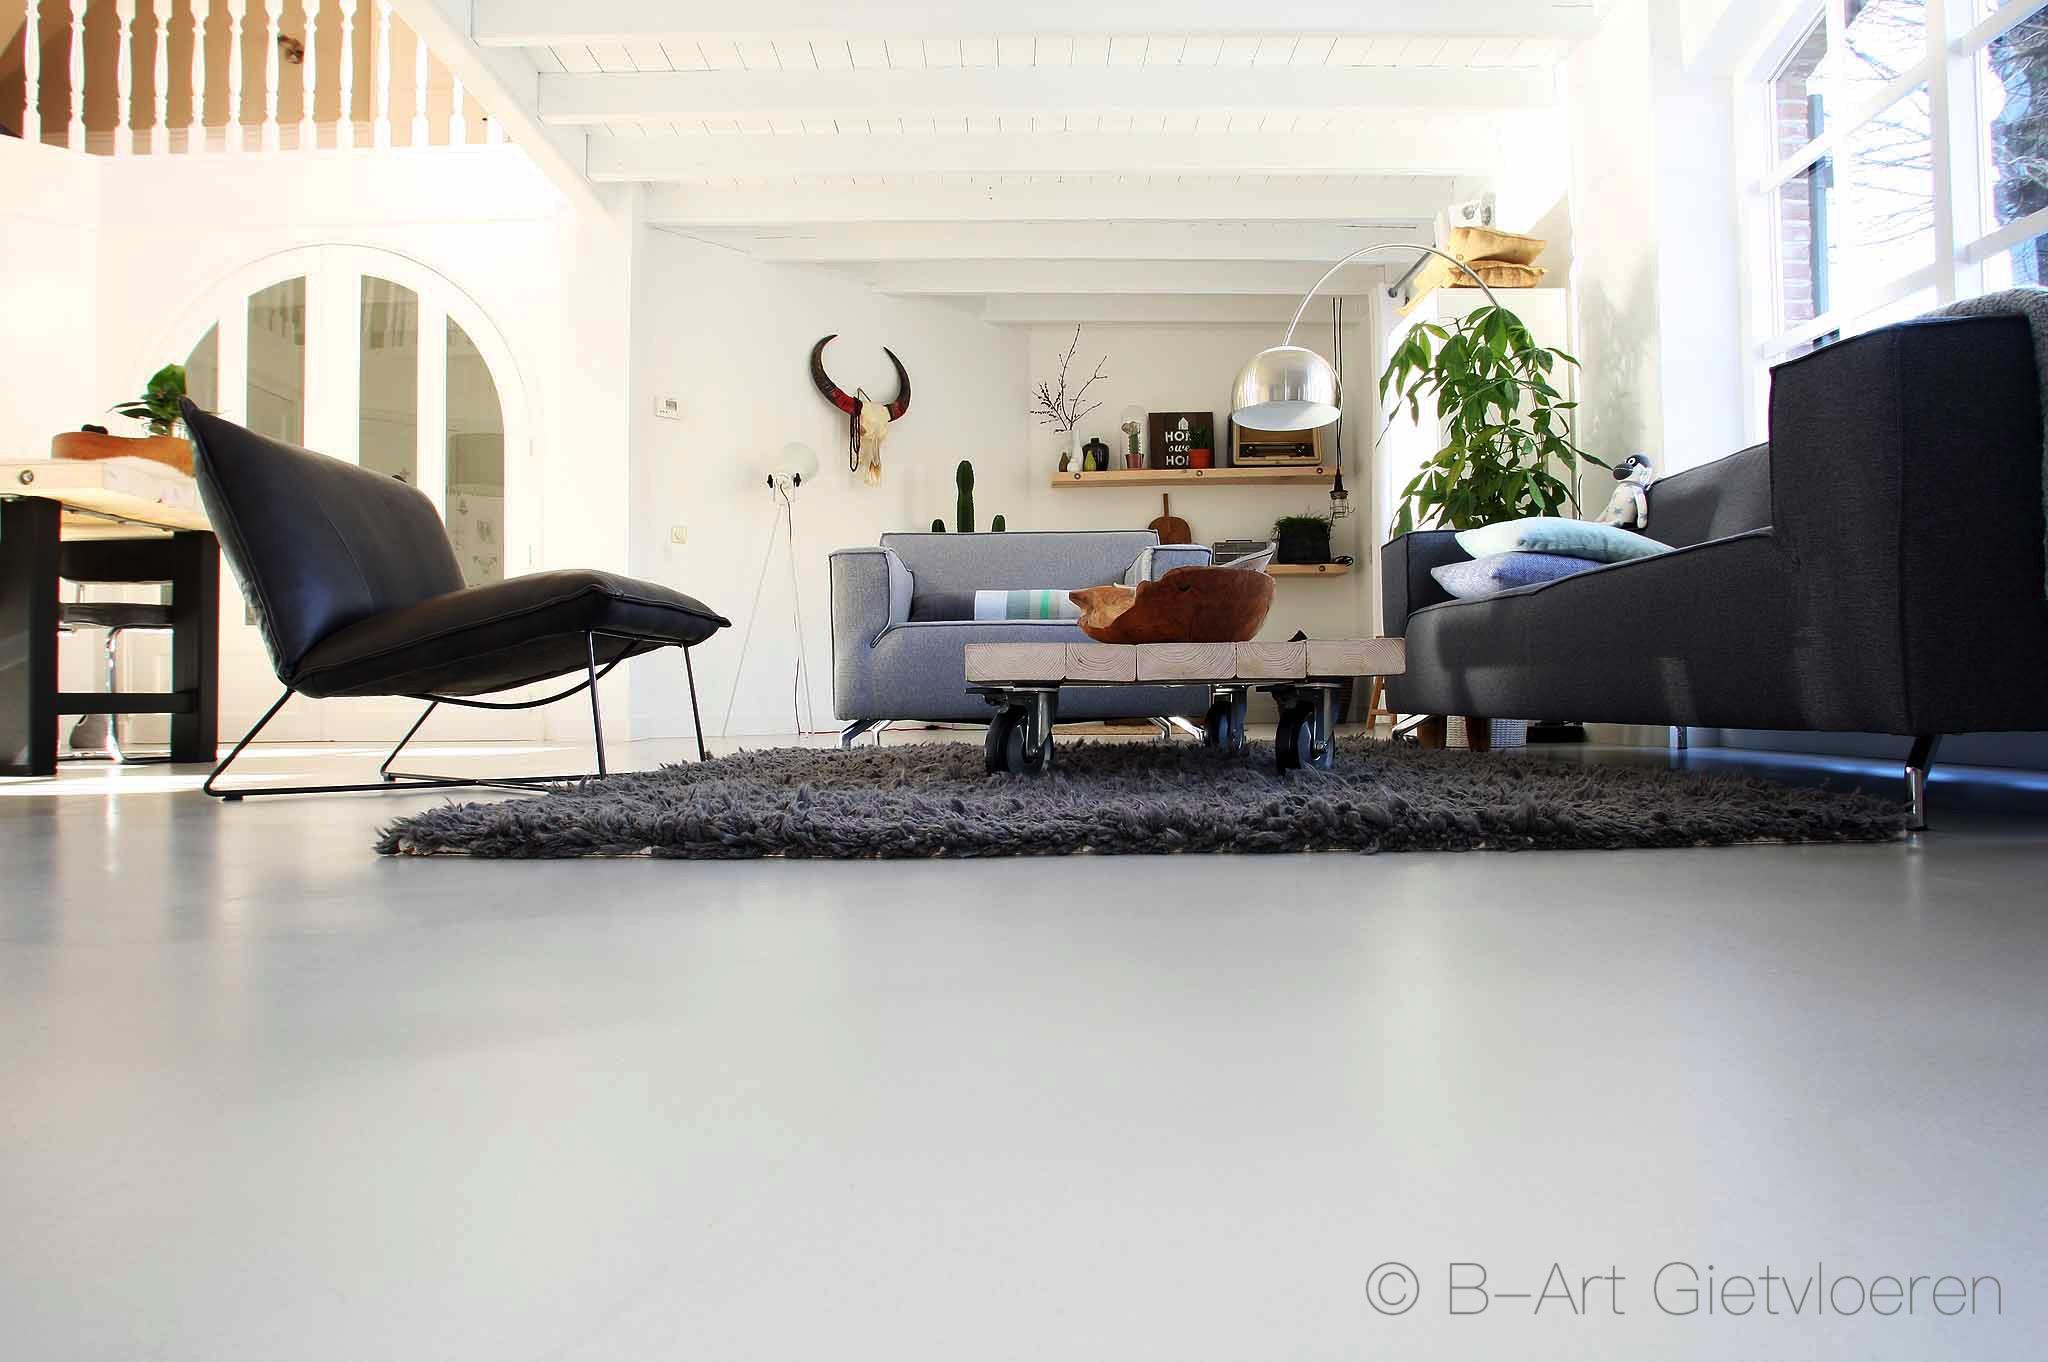 Concrete Art gietvloer woonkamer